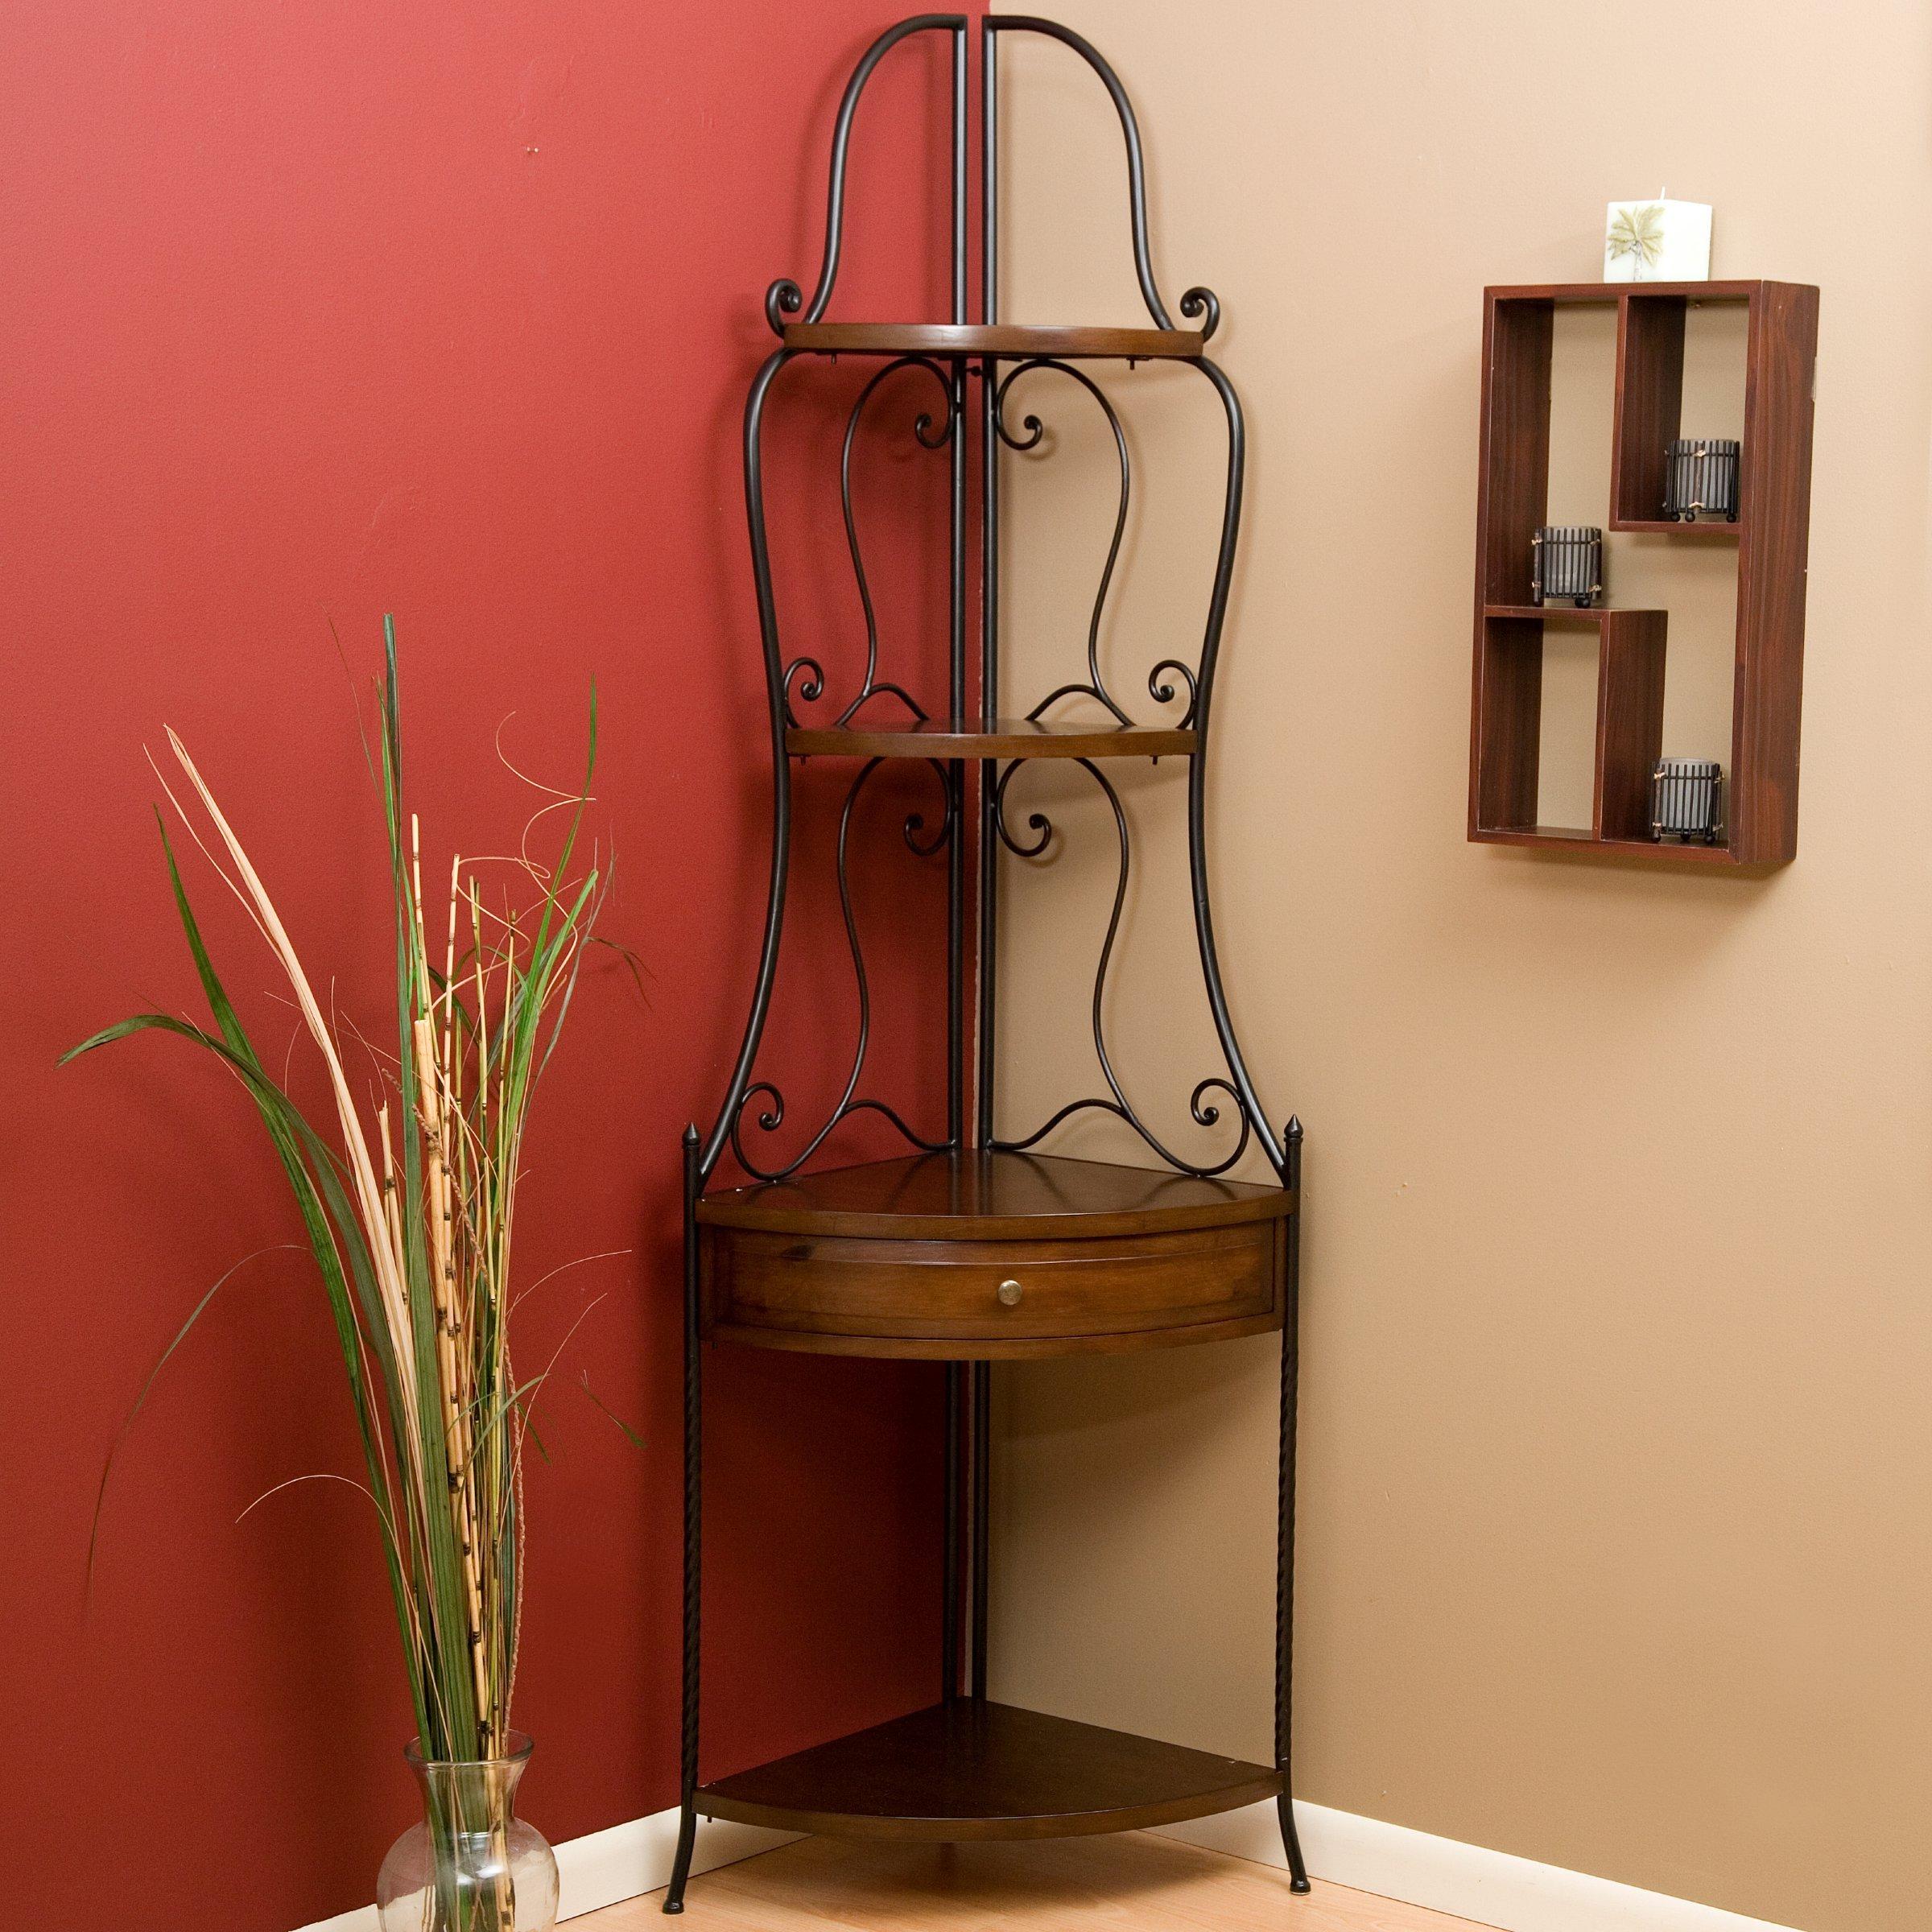 Wrought Iron Corner Bakers Rack with Wood Shelves, Heritage Oak Finish by Belham Living (Image #2)